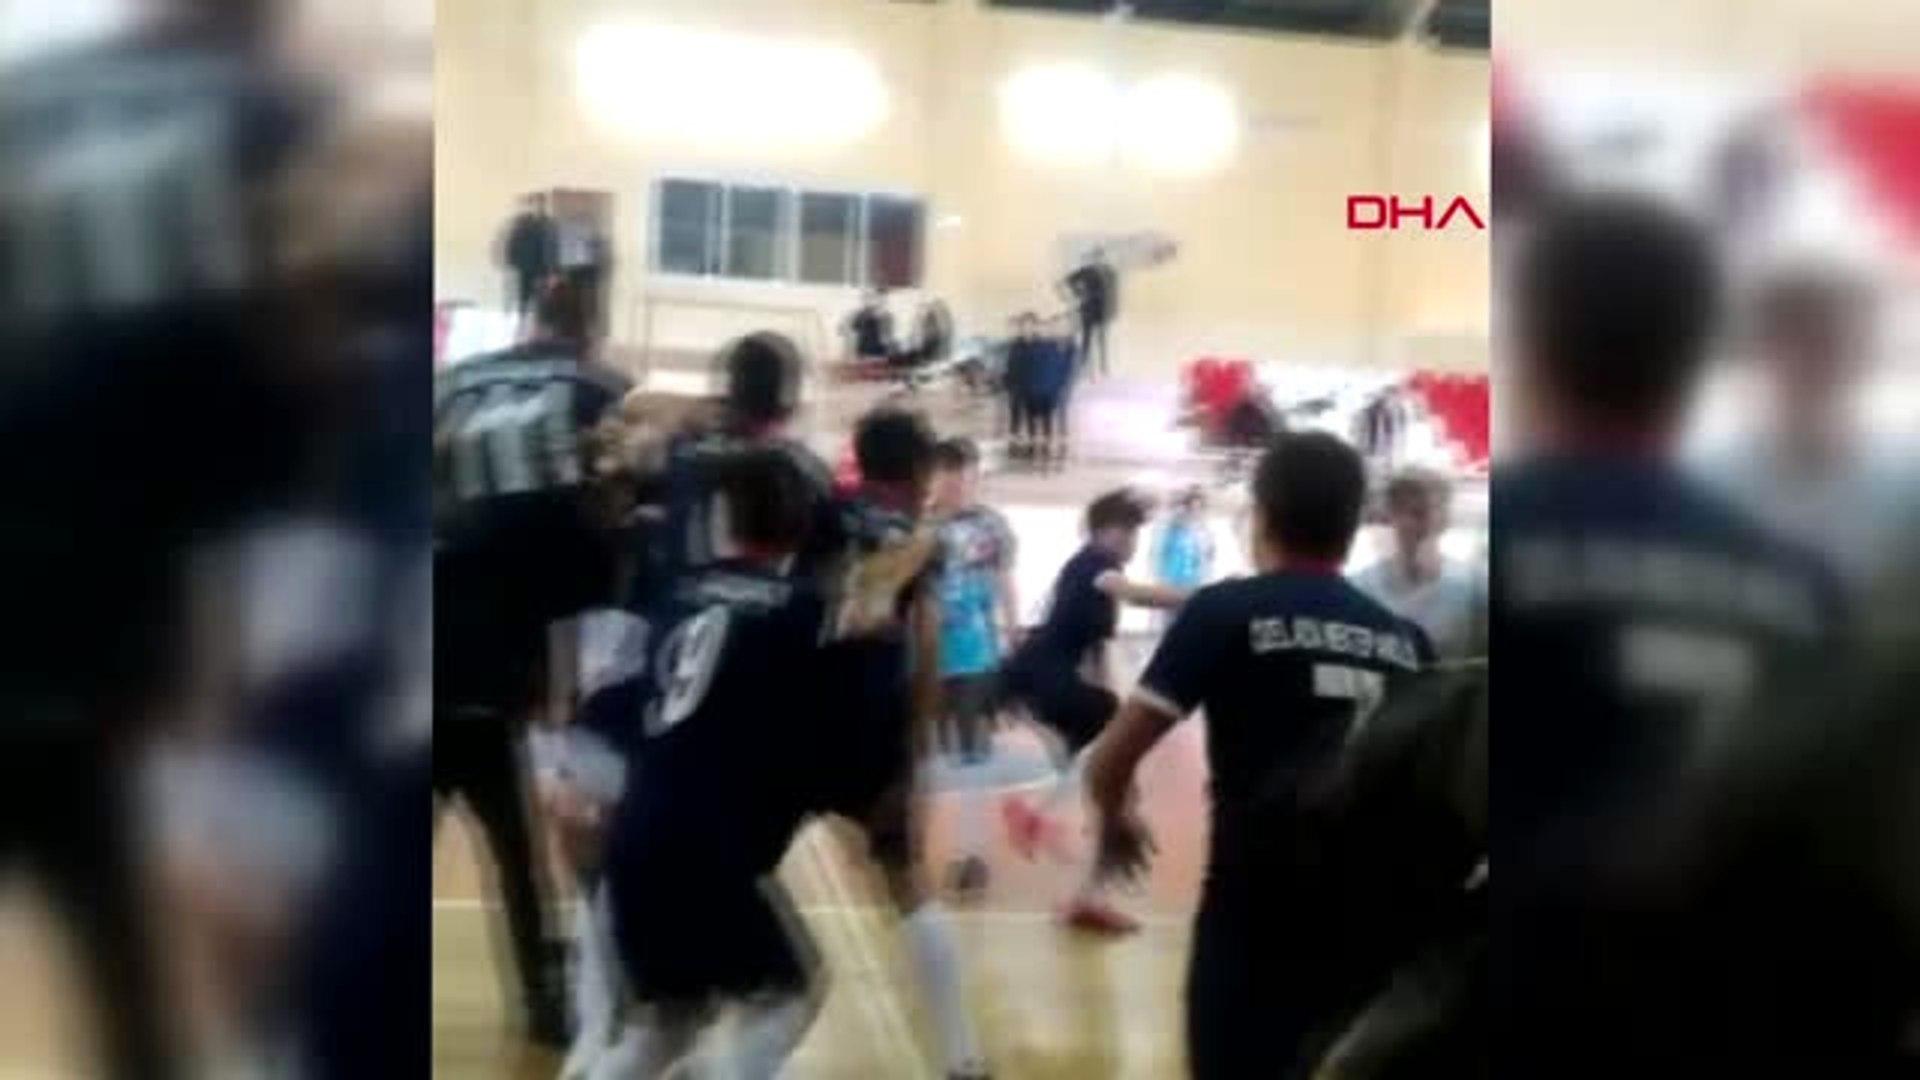 Sakarya Liseli Futbolcular Sahada Tekme-Tokat Kavga Etti